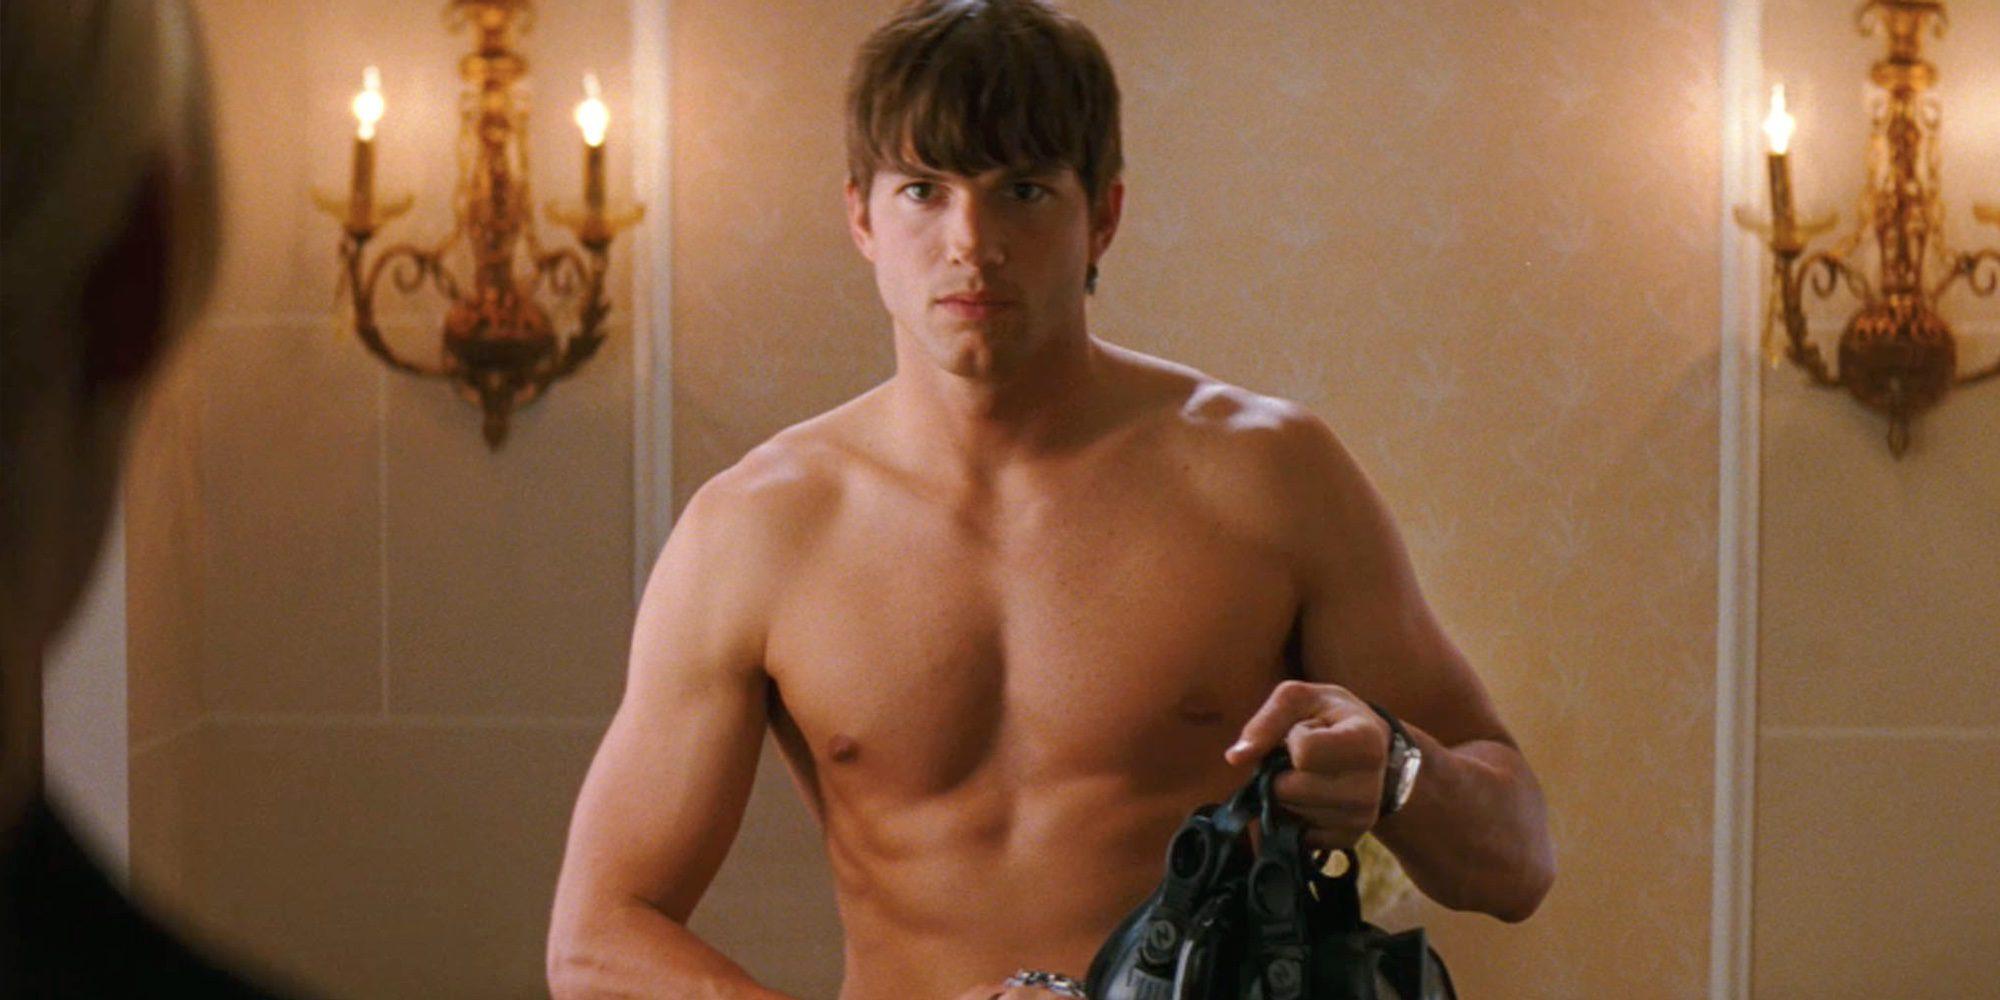 Los 5 momentos más sexys de Ashton Kutcher